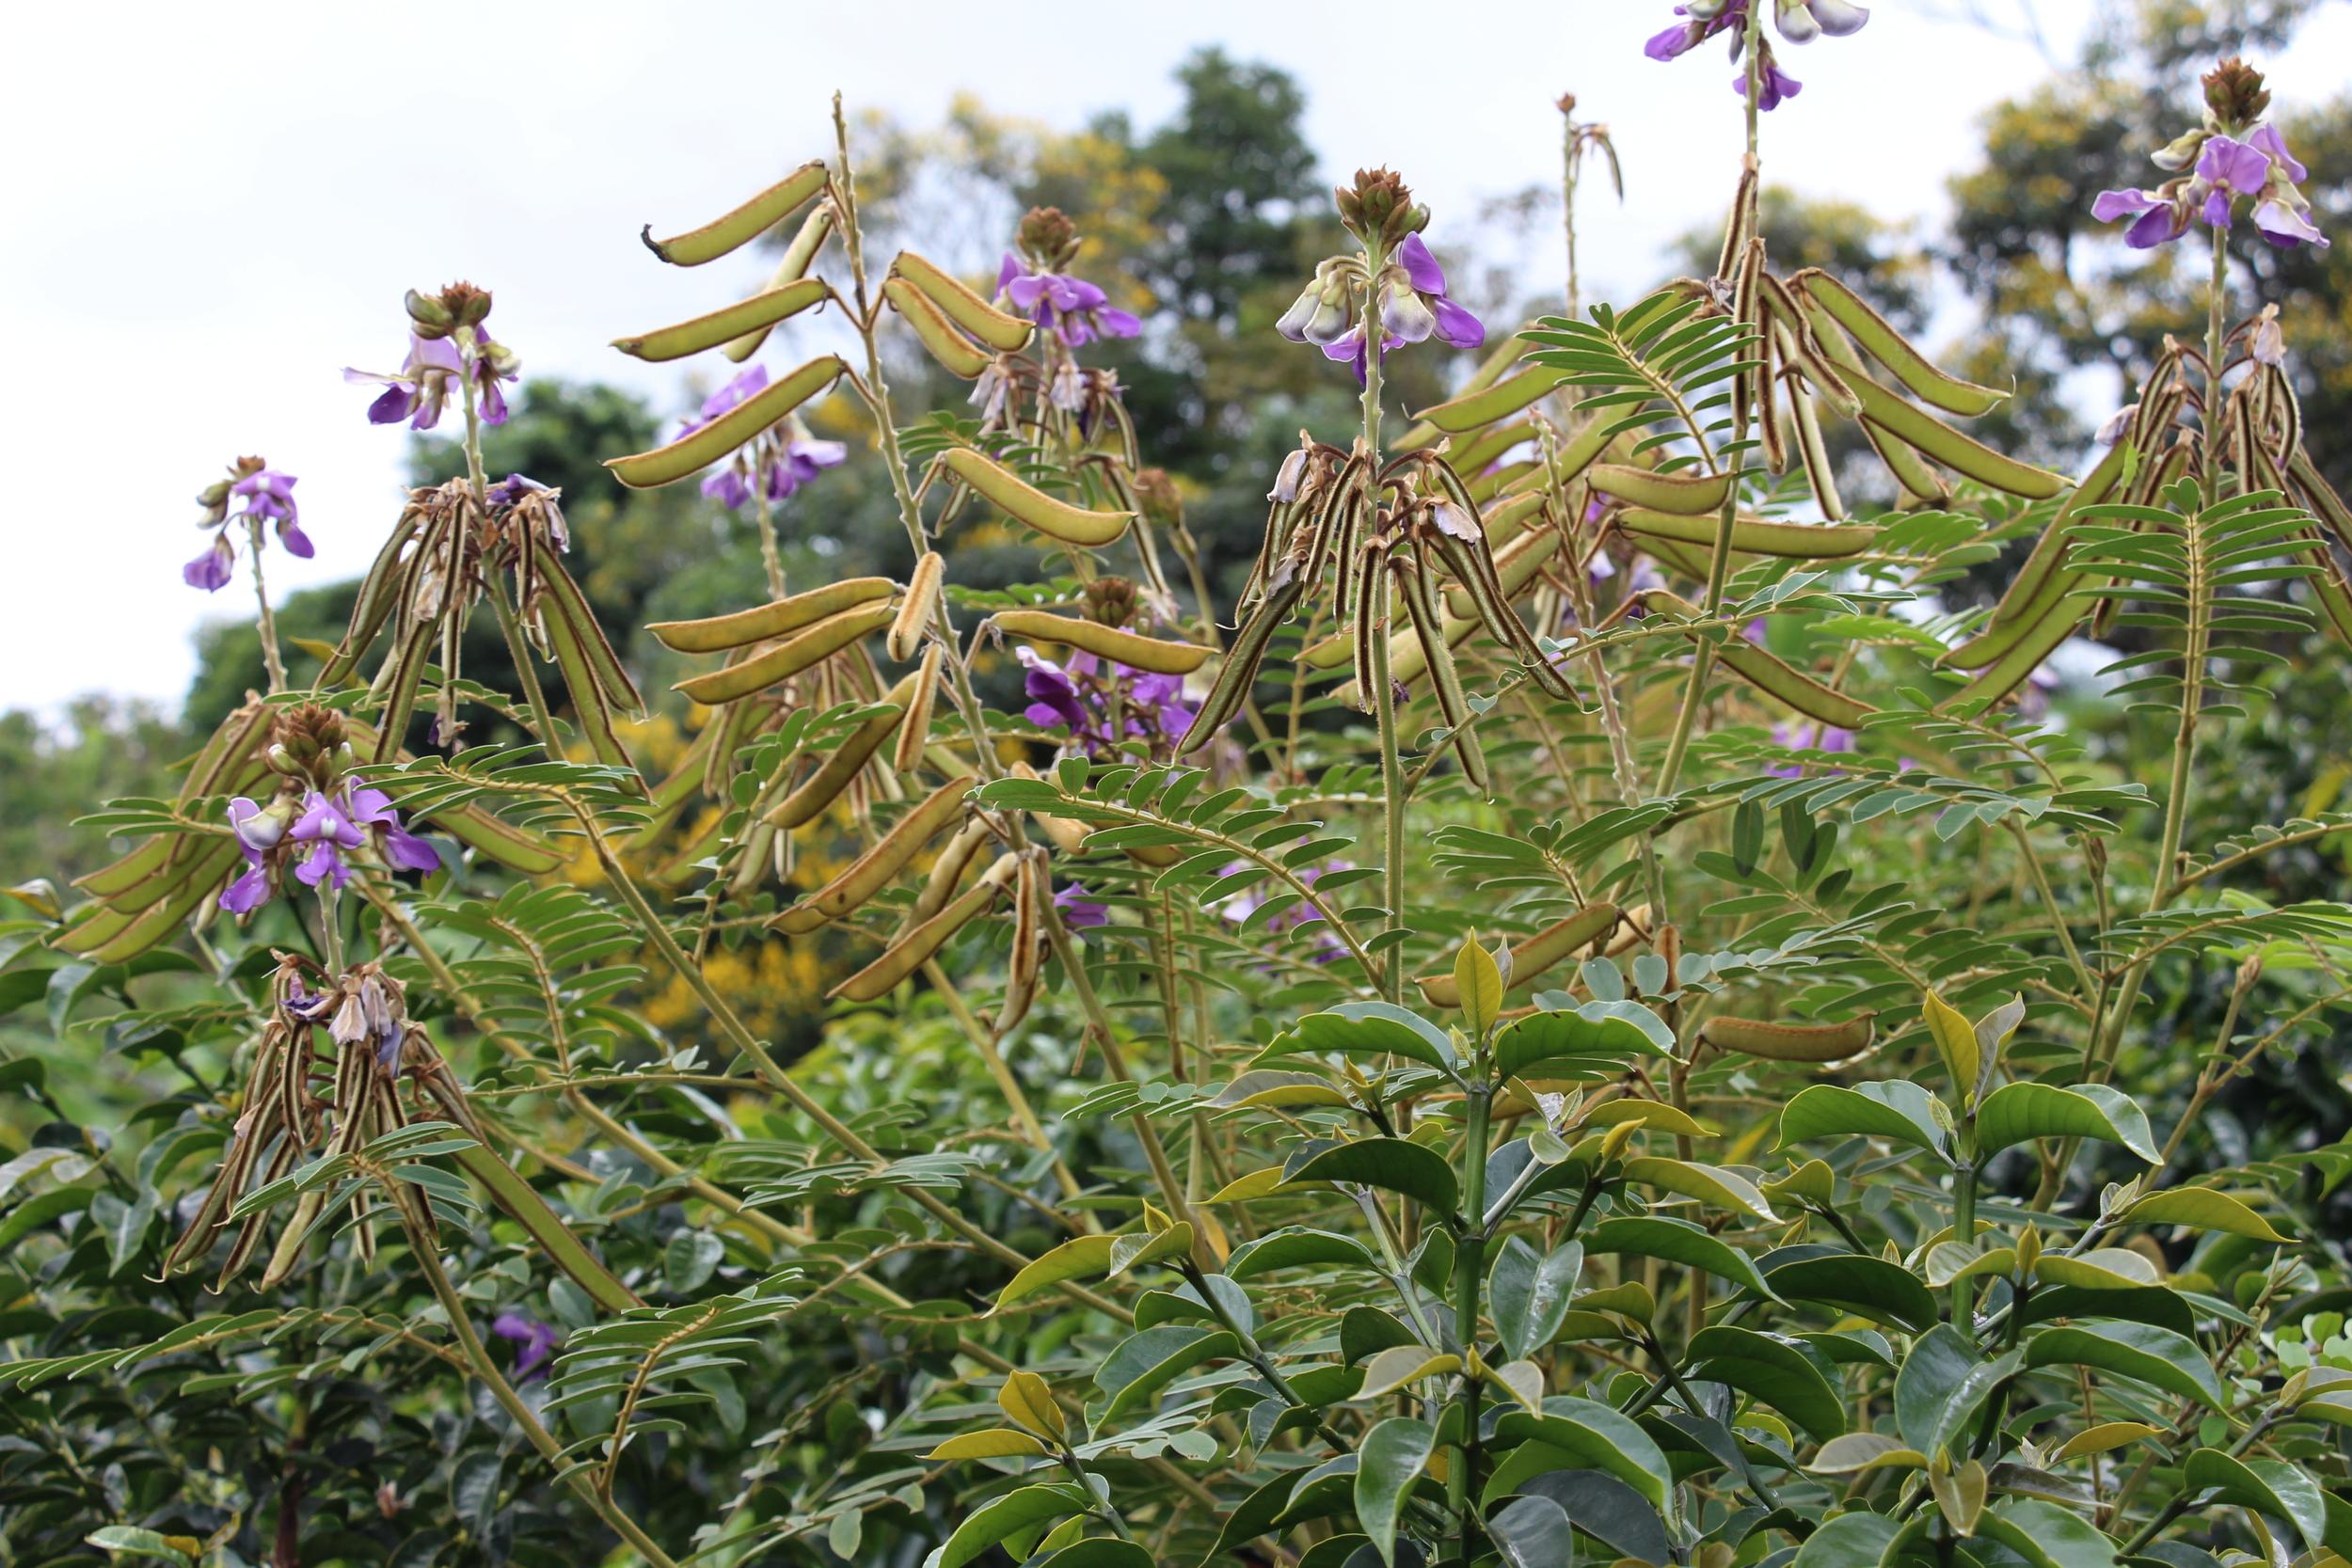 Tephrosia plant - used as nitrogen fixer for the soil